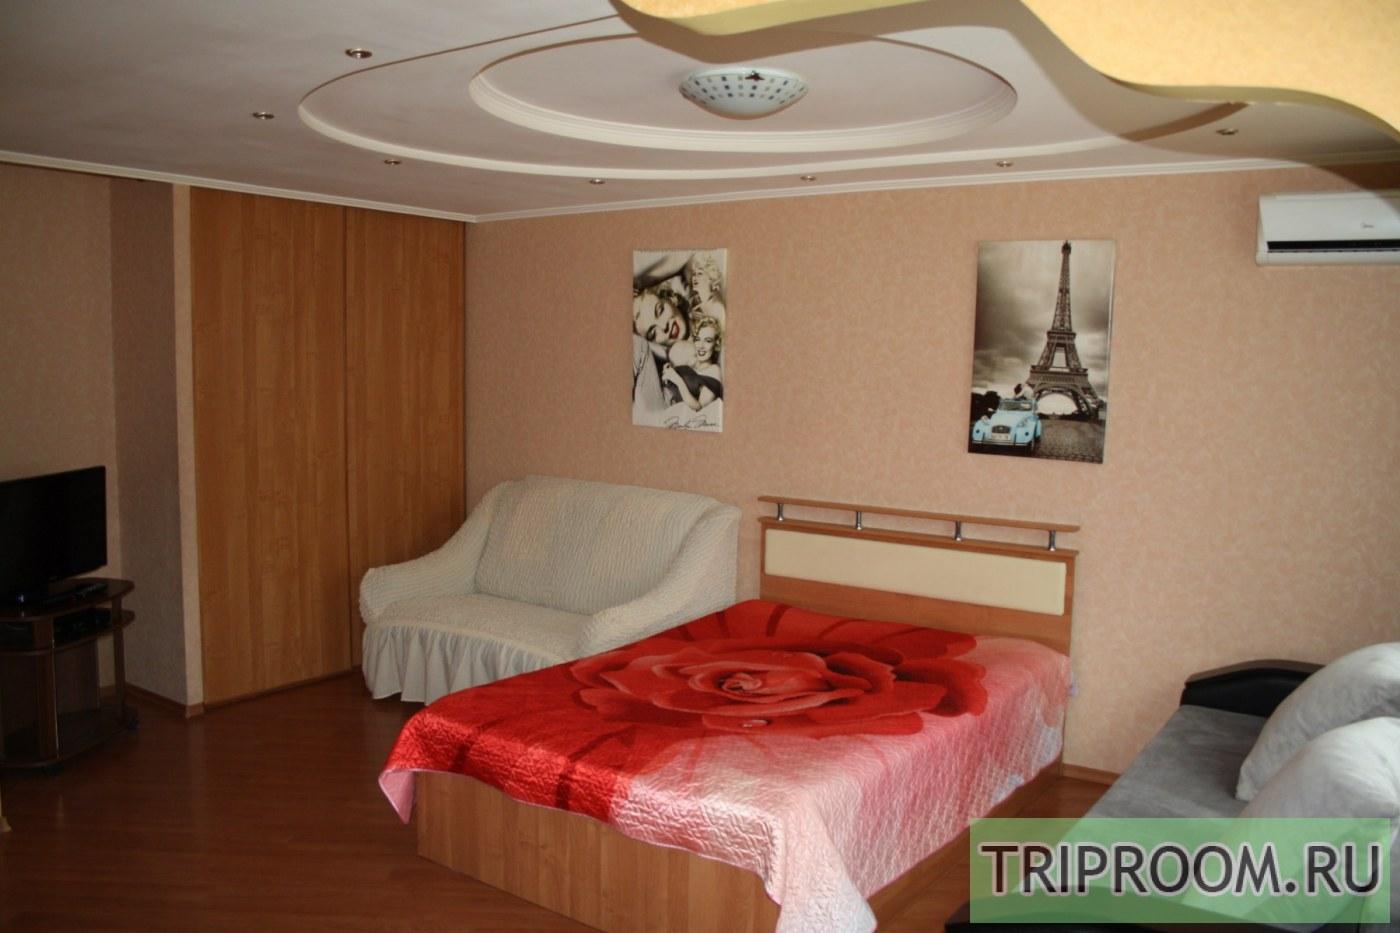 1-комнатная квартира посуточно (вариант № 39644), ул. Ипподромная улица, фото № 5